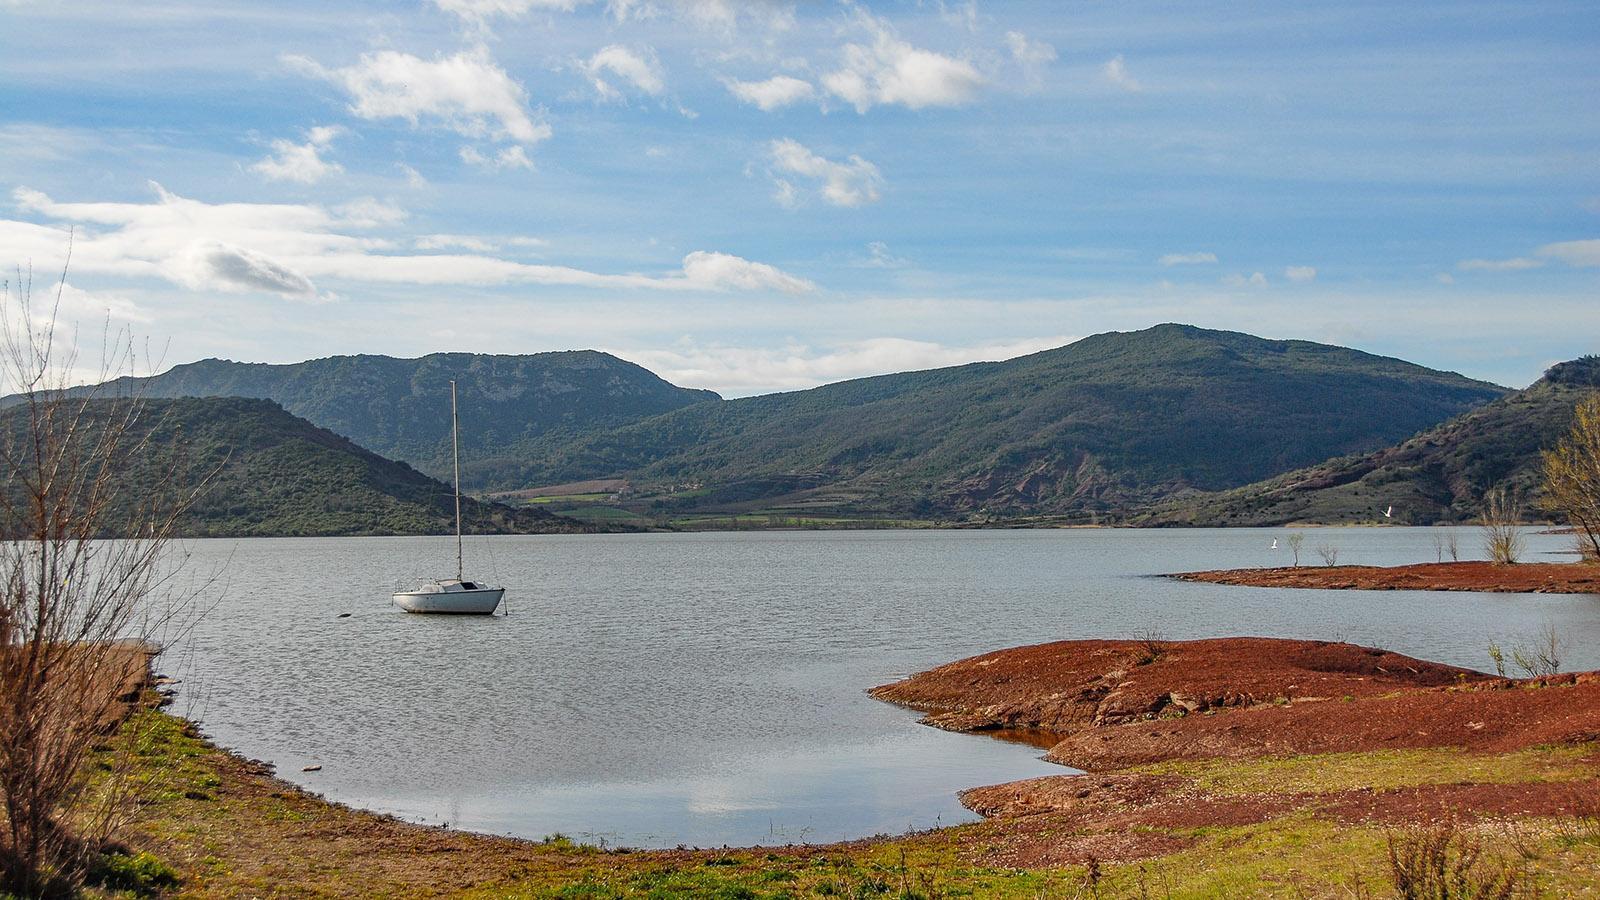 Lac de Salagou. Foto: Hilke Maunder